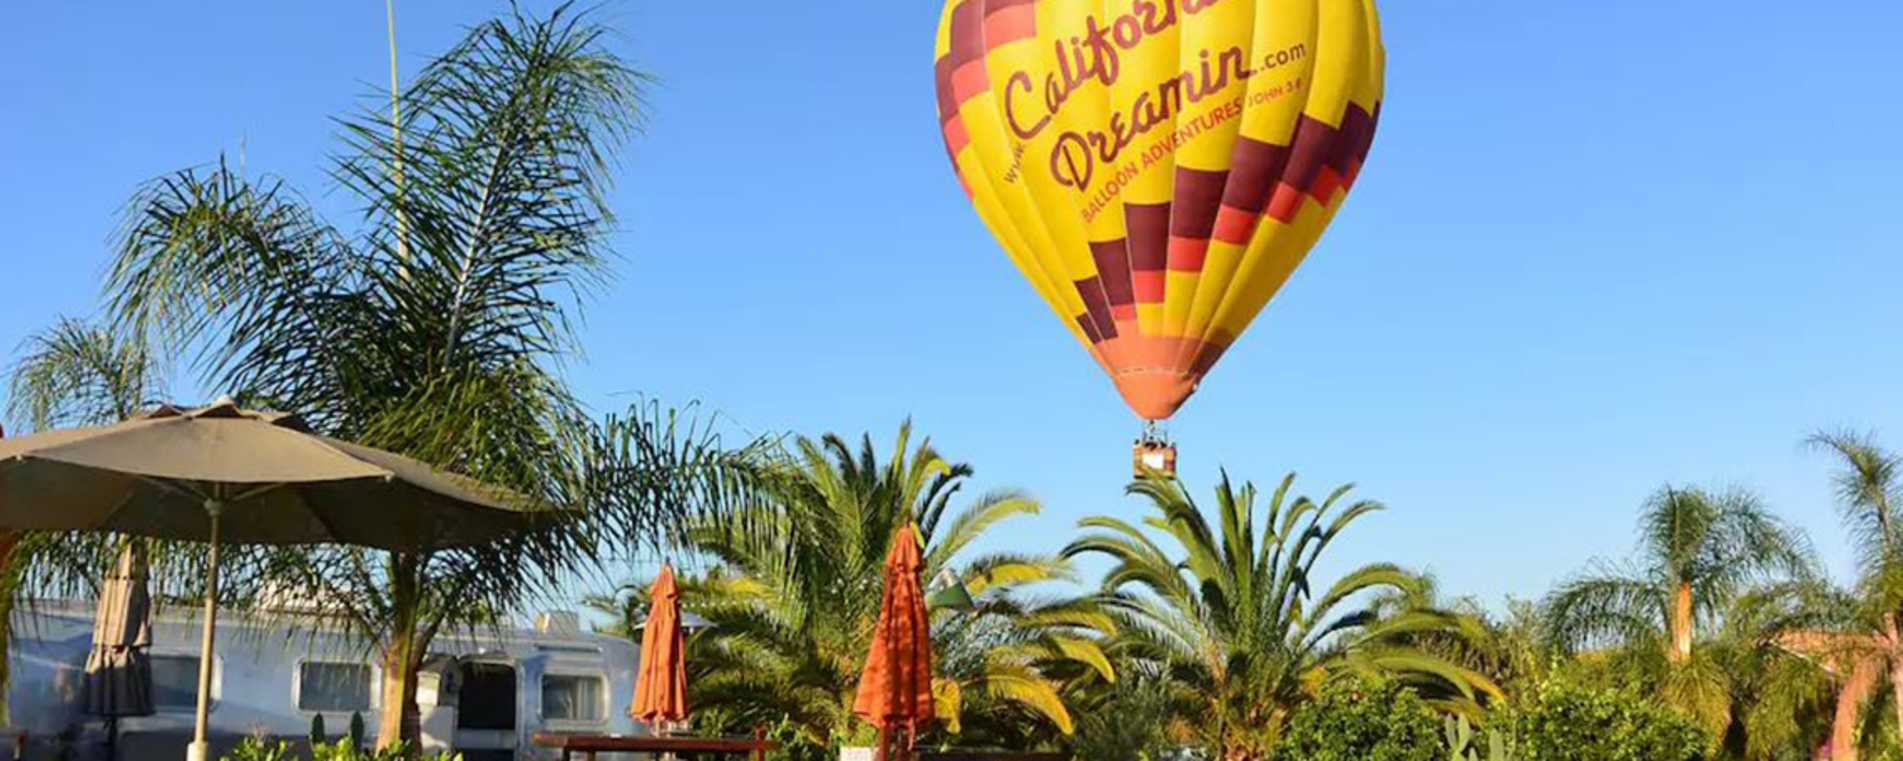 A Balloon Adventure by California Dreamin' - Temecula